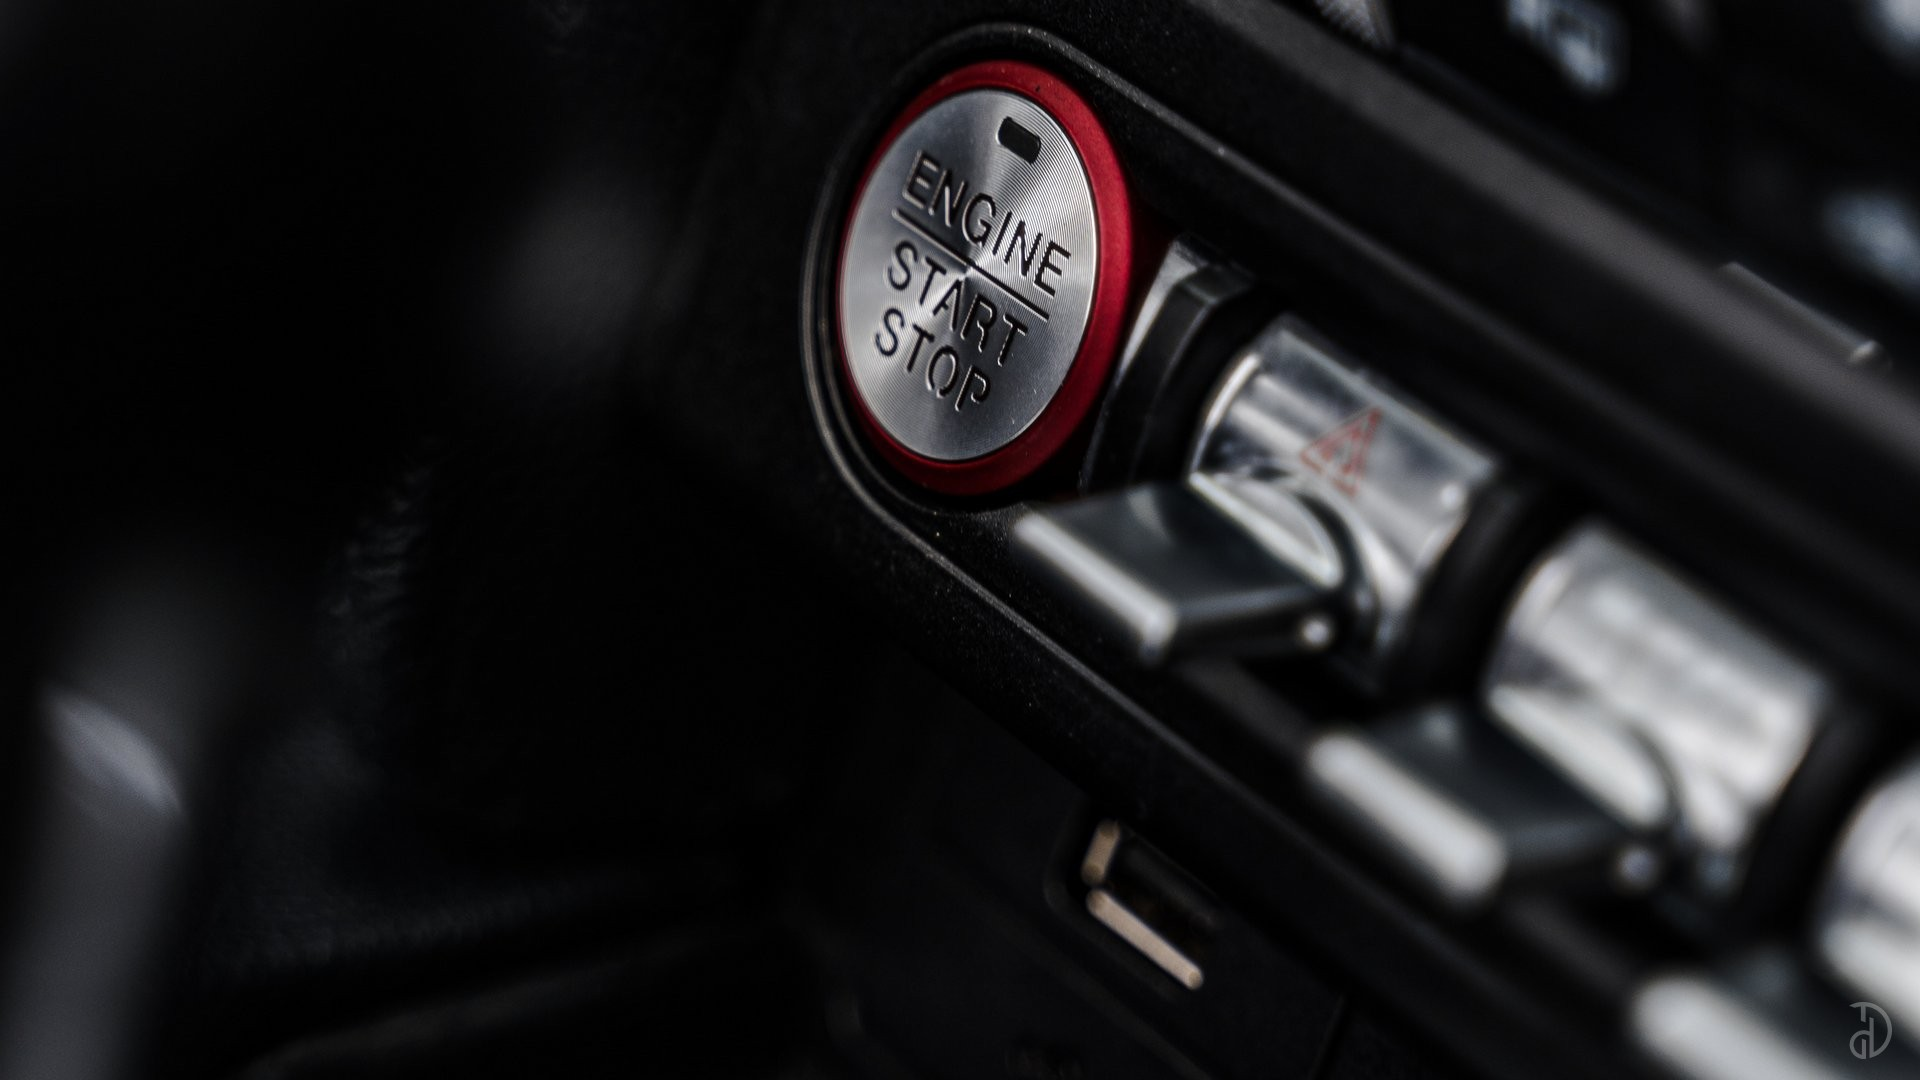 Аренда Ford Mustang GT 5.0 в Сочи. Фото 11